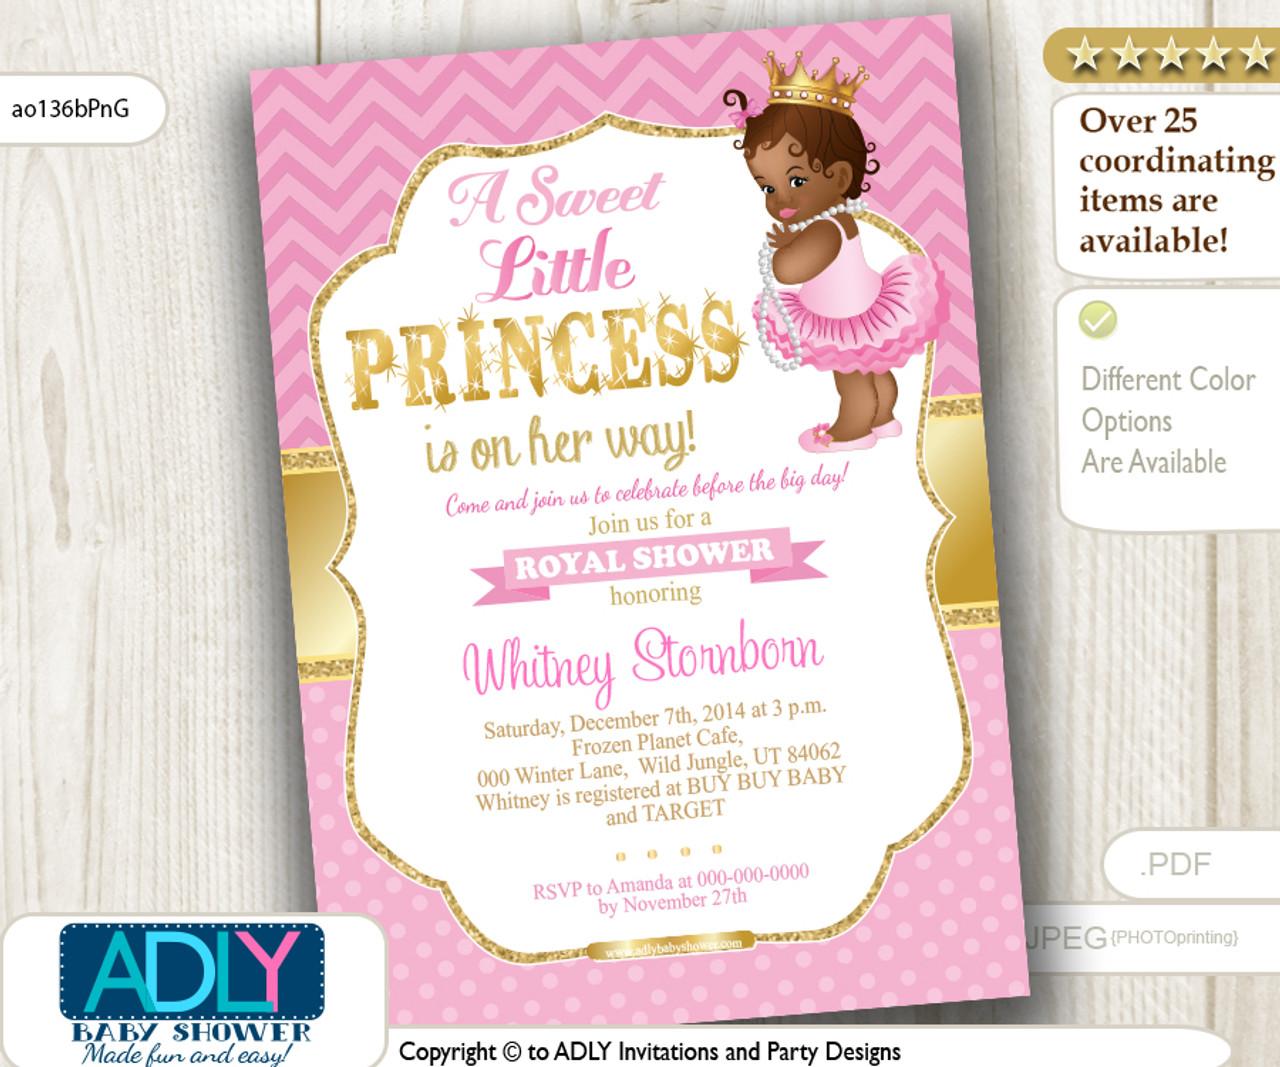 Ballerina clipart baby shower, Ballerina baby shower Transparent FREE for  download on WebStockReview 2020